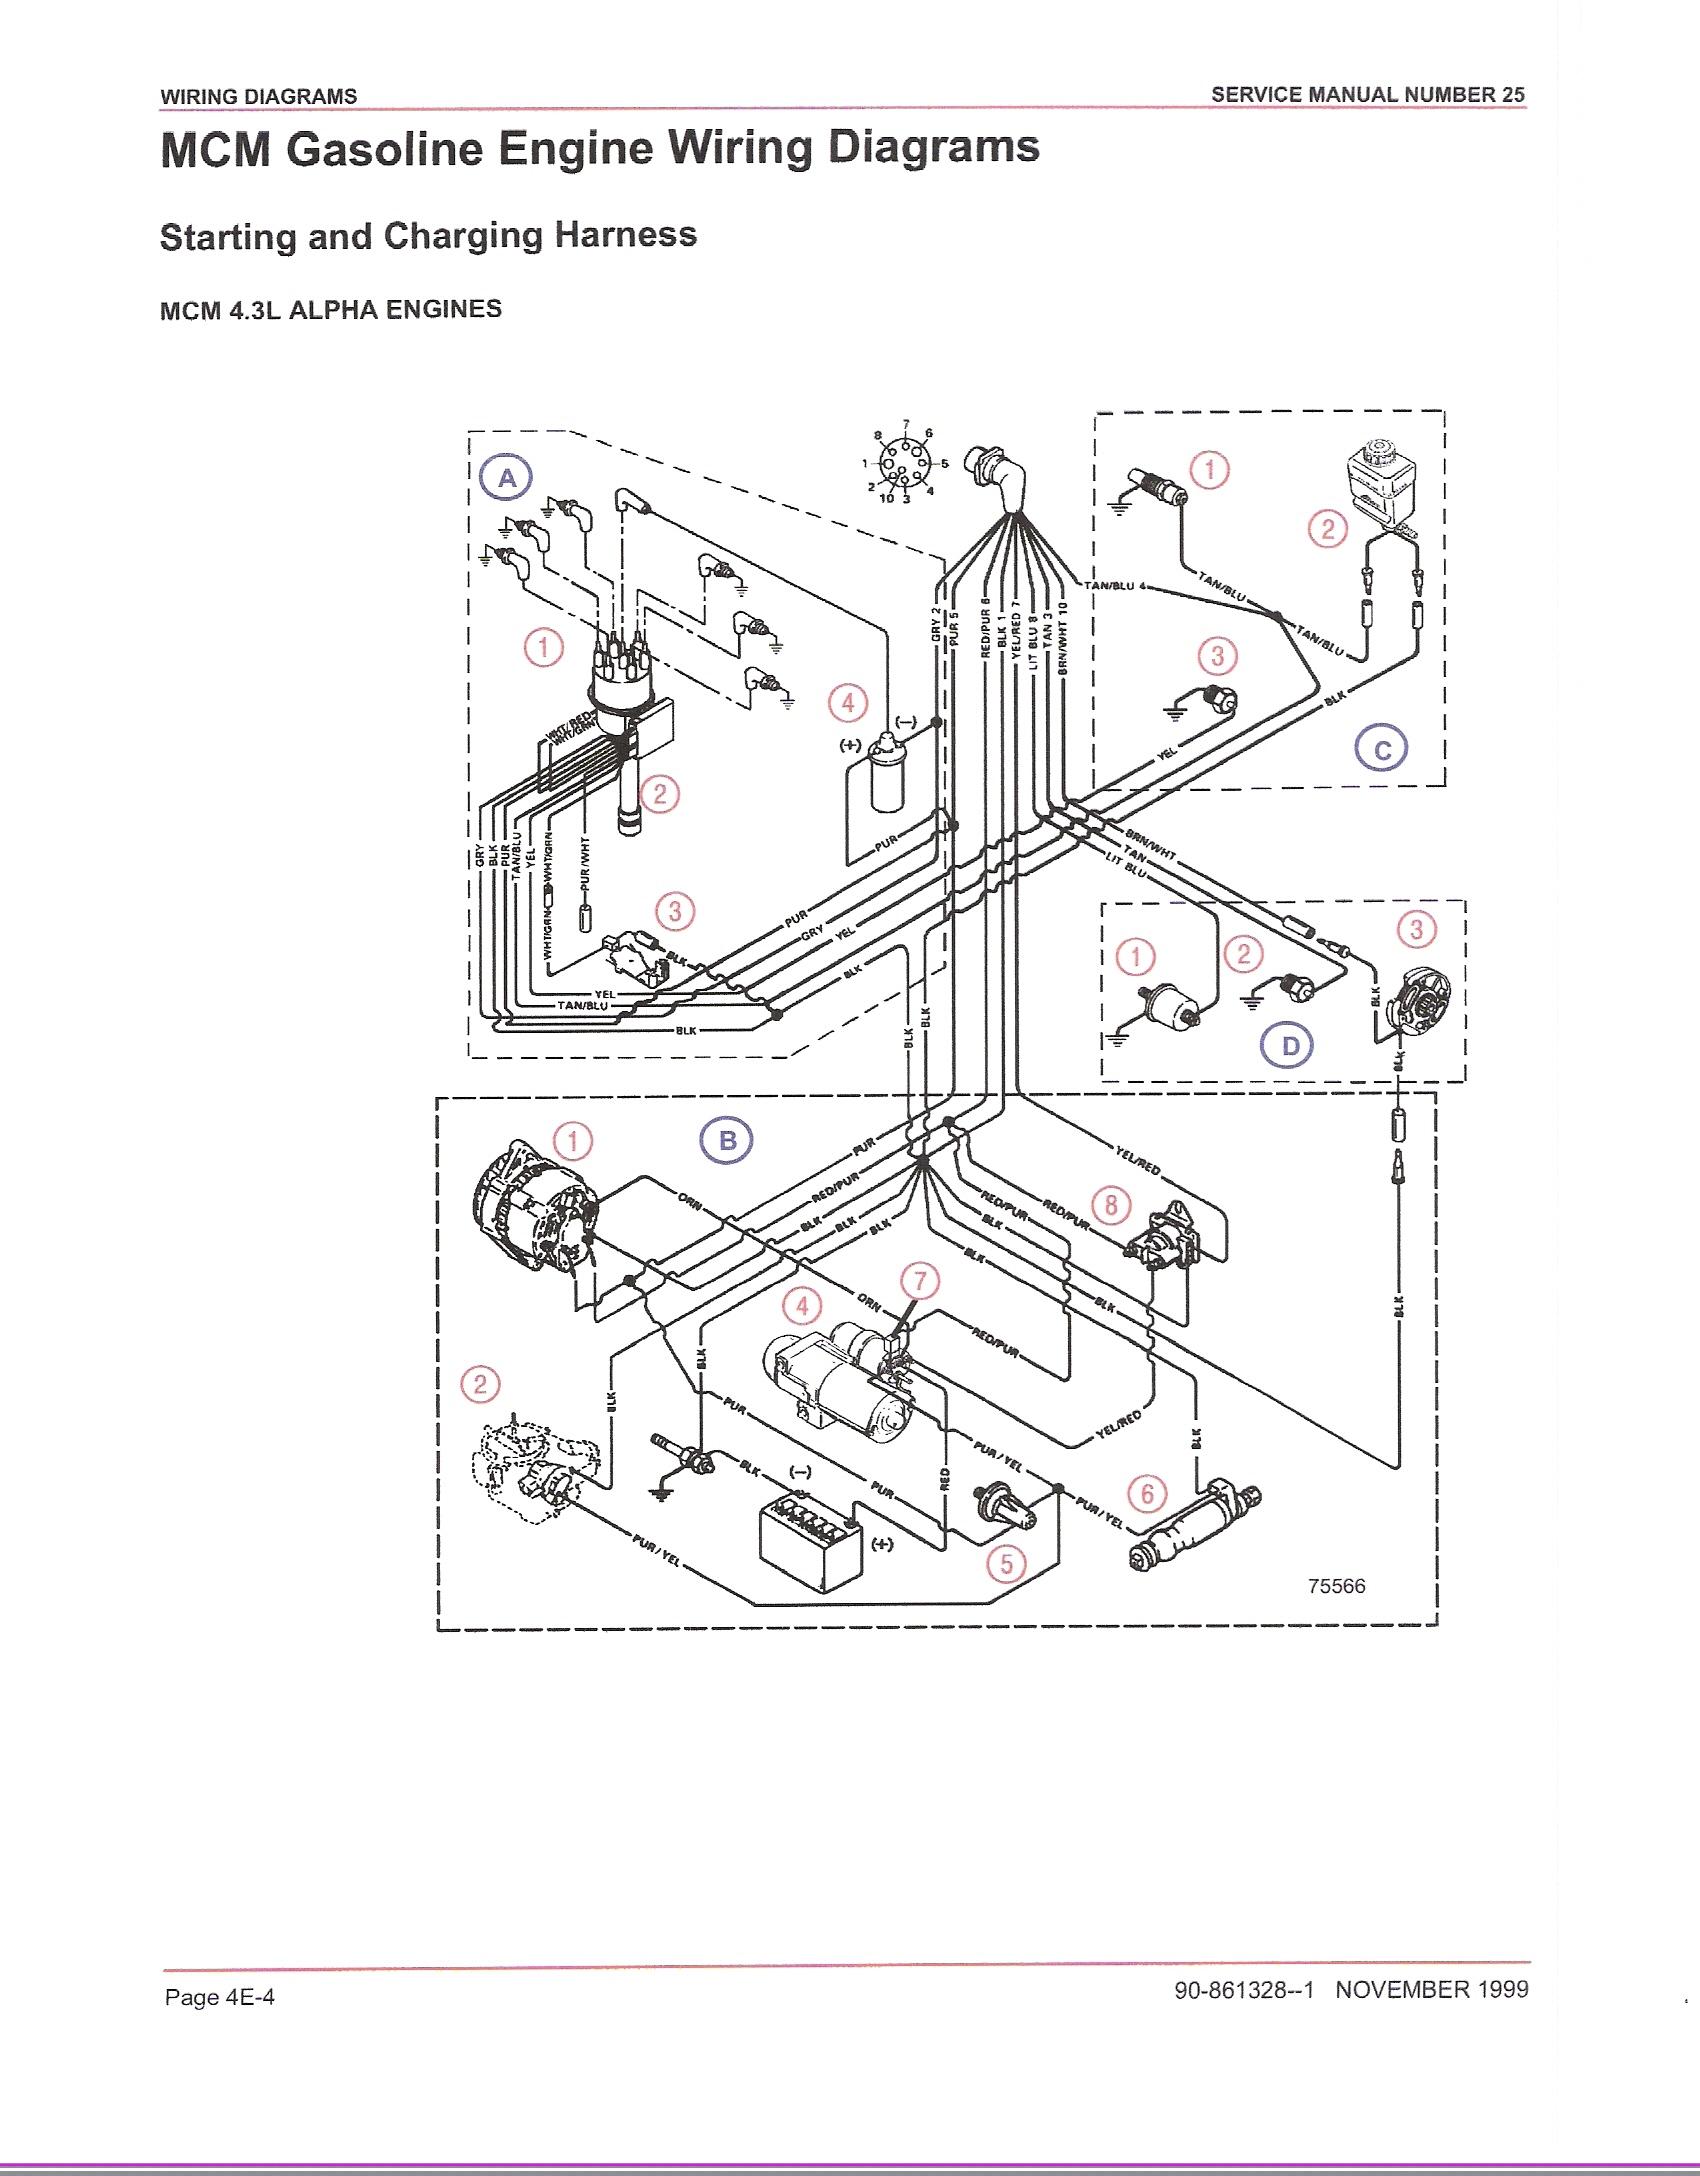 to mercruiser alternator wiring diagram ld 5419  mercruiser 4 3 wiring diagram mercruiser 5 7 wiring diagram  ld 5419  mercruiser 4 3 wiring diagram